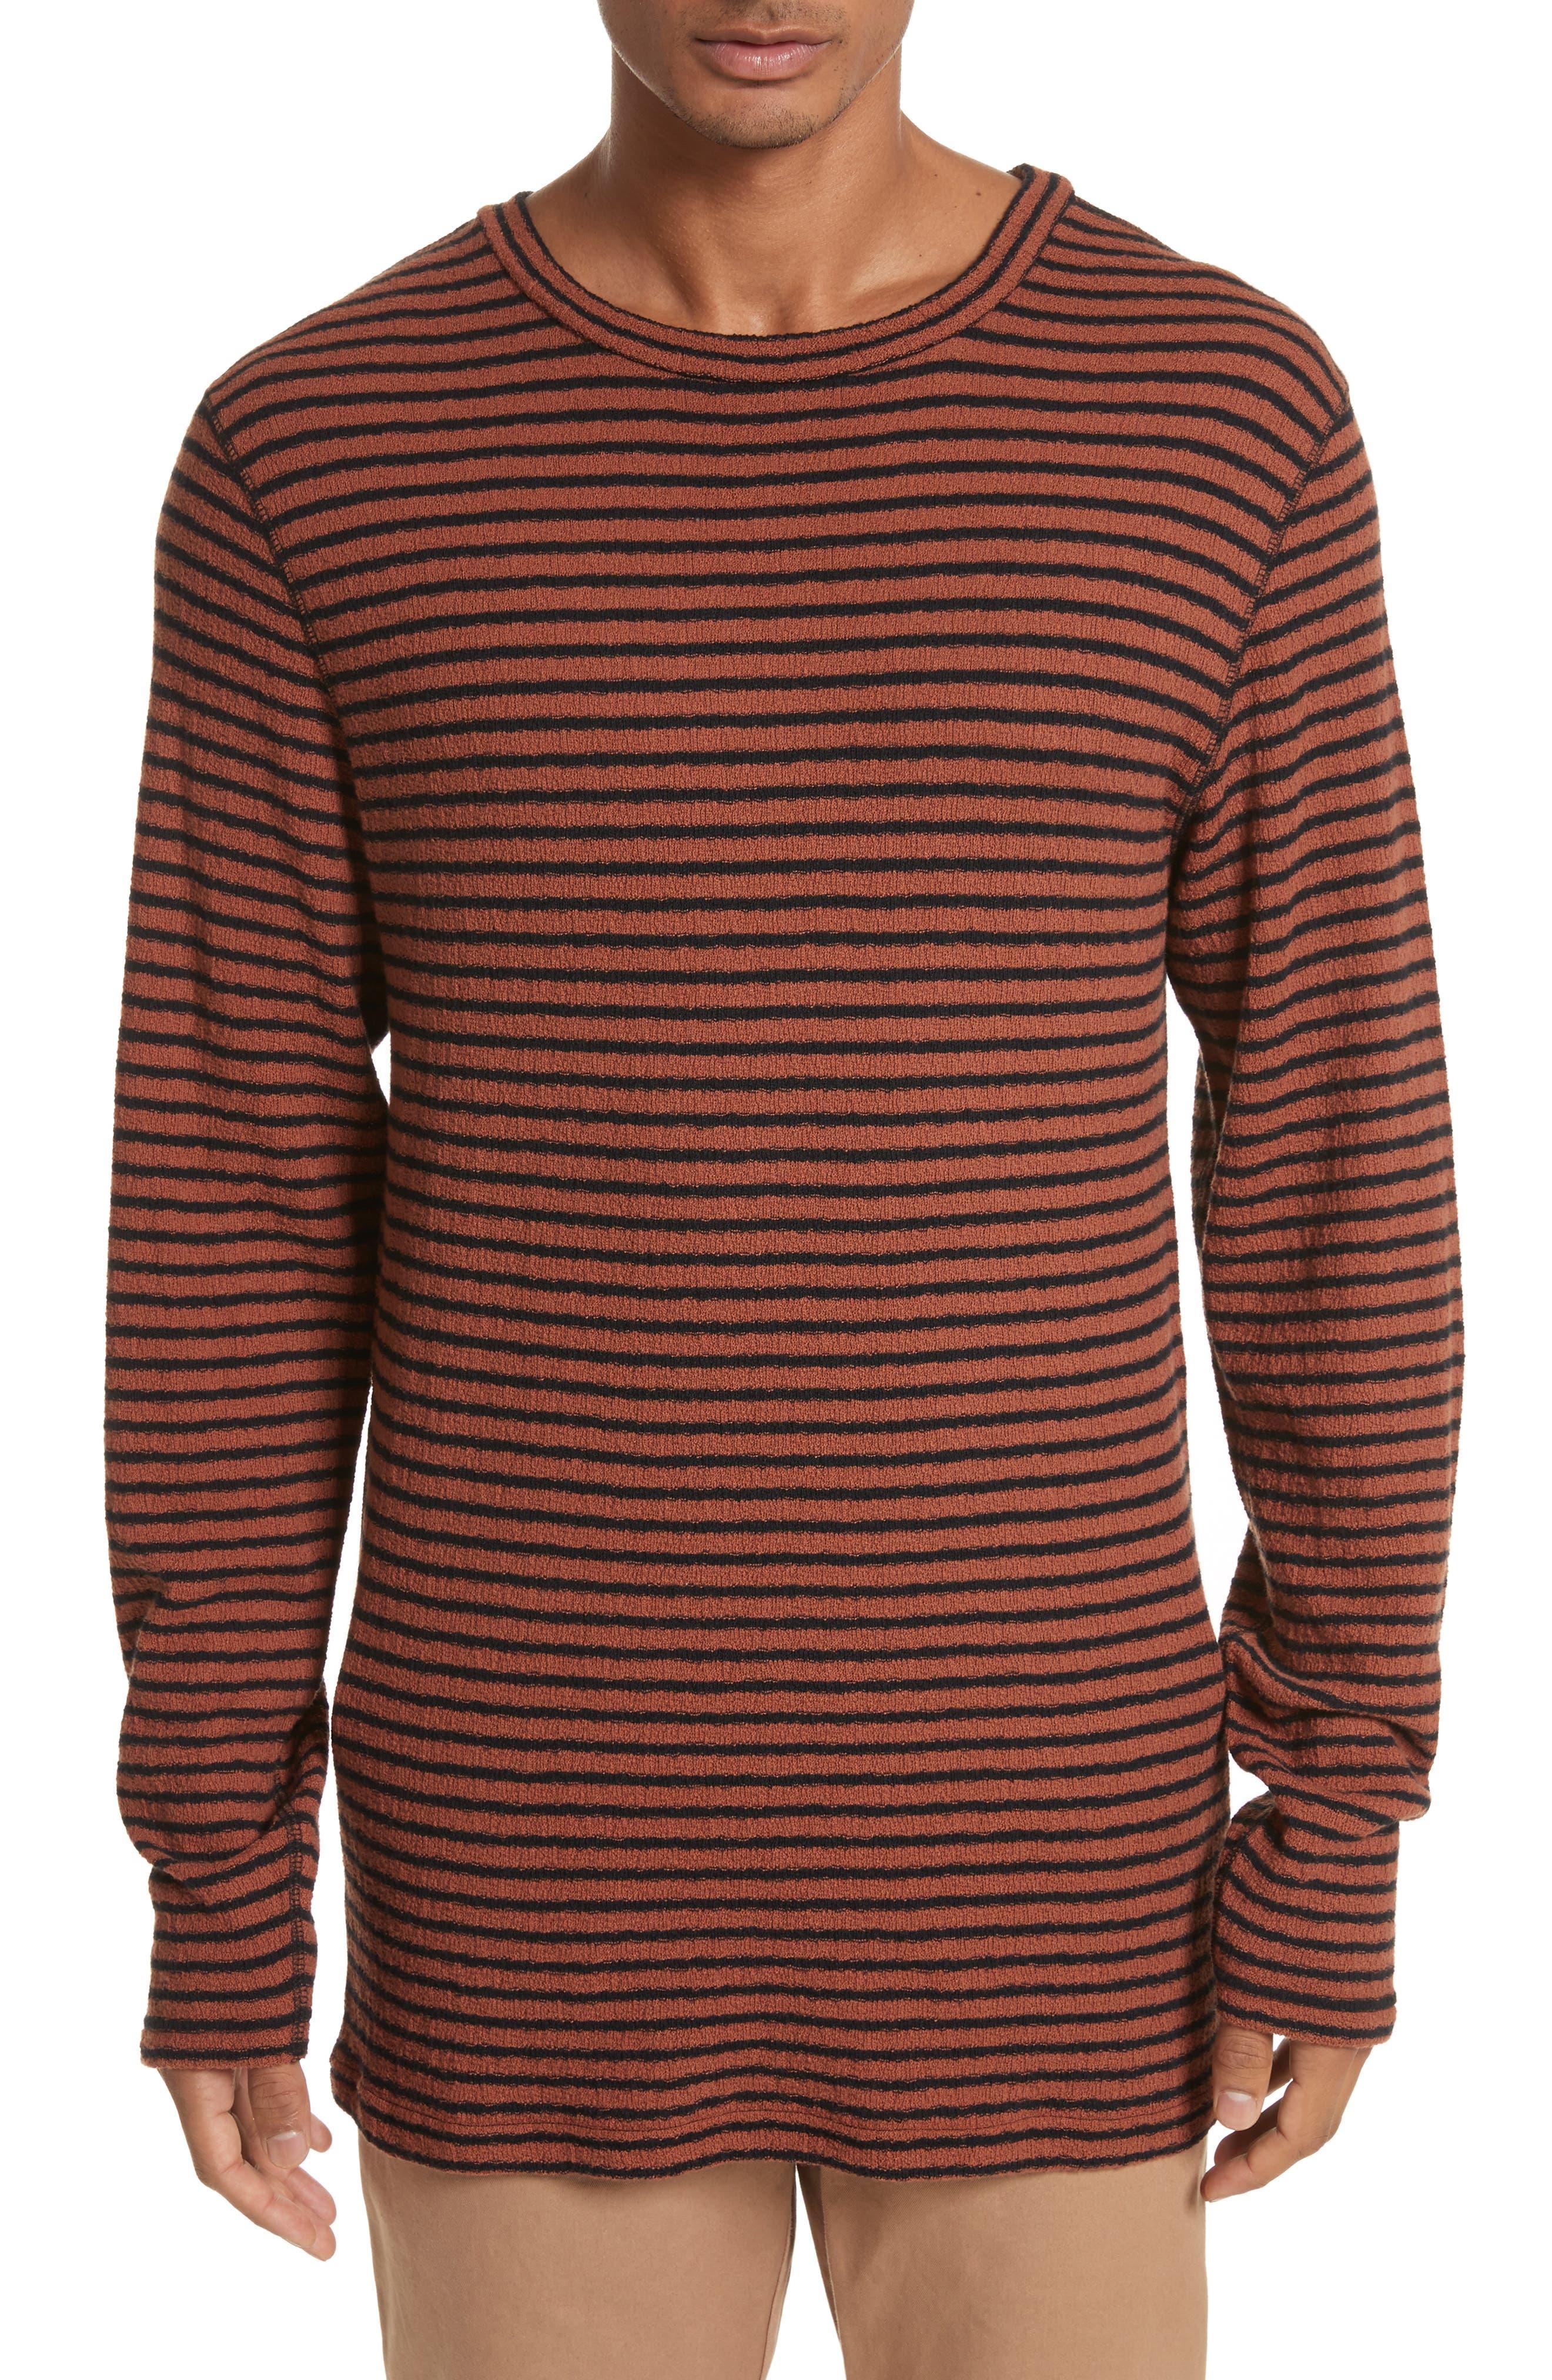 Main Image - Saturdays NYC Alex Stripe Long Sleeve T-Shirt